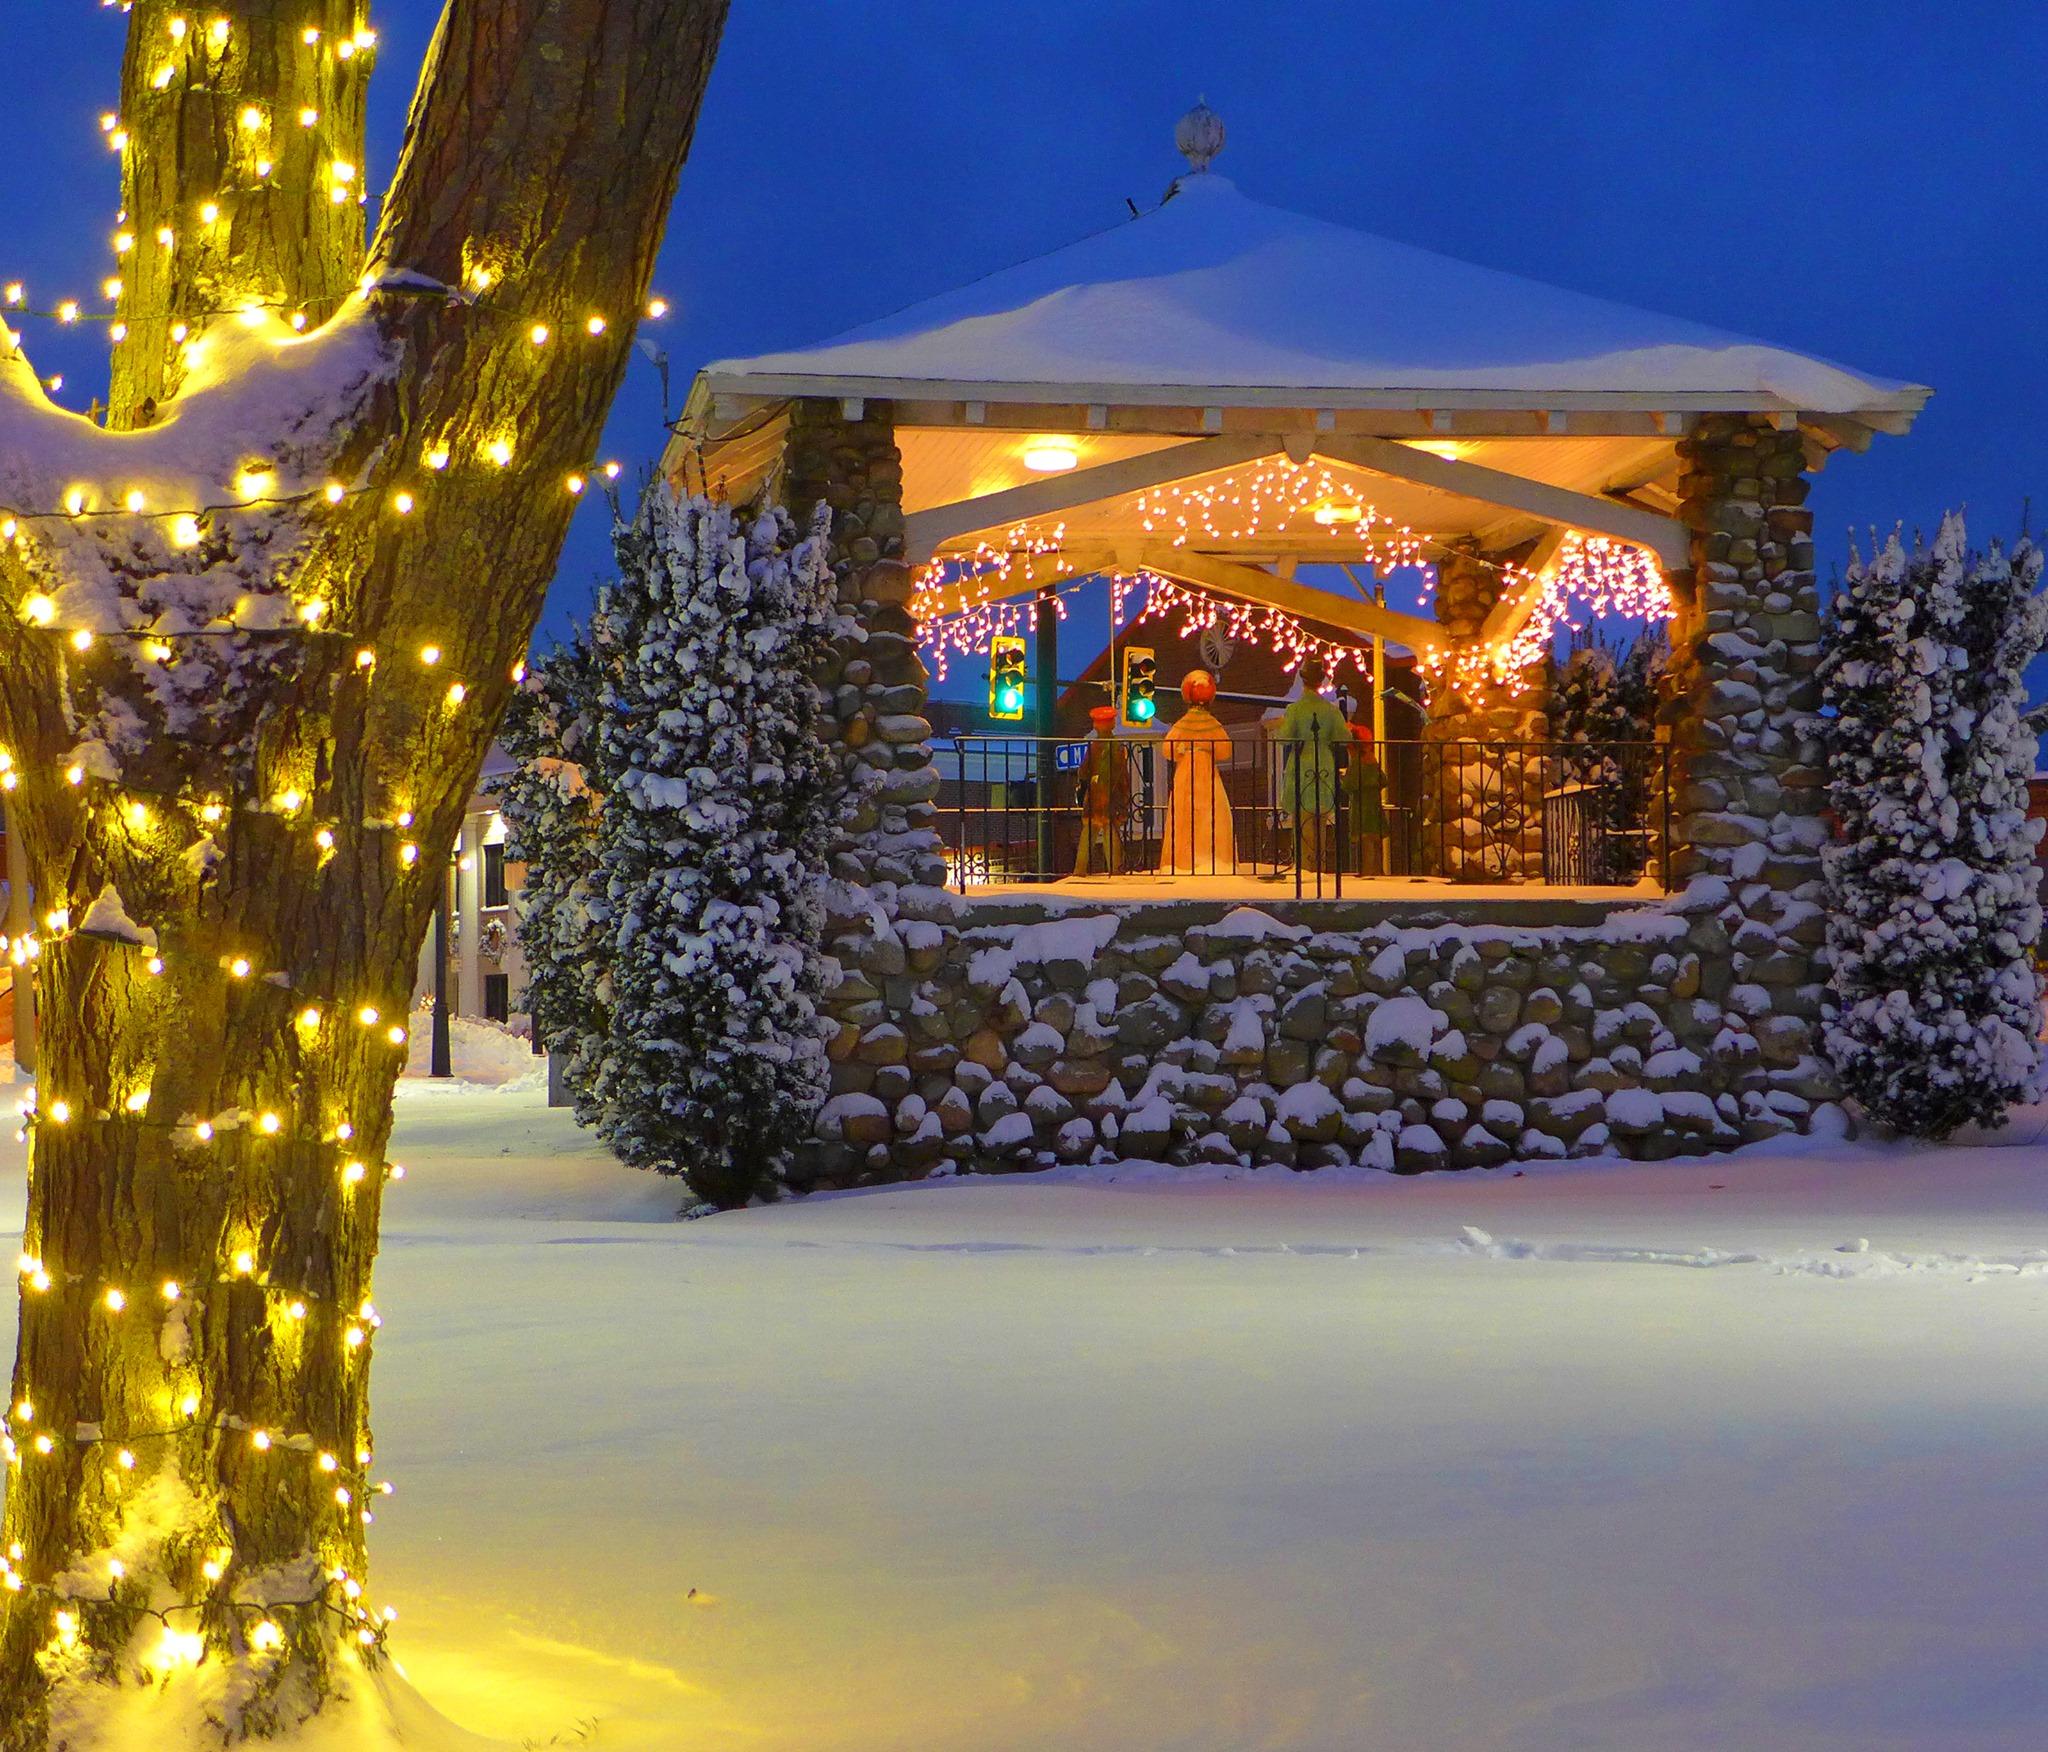 Christmas in downtown Walpole, Massachusetts.